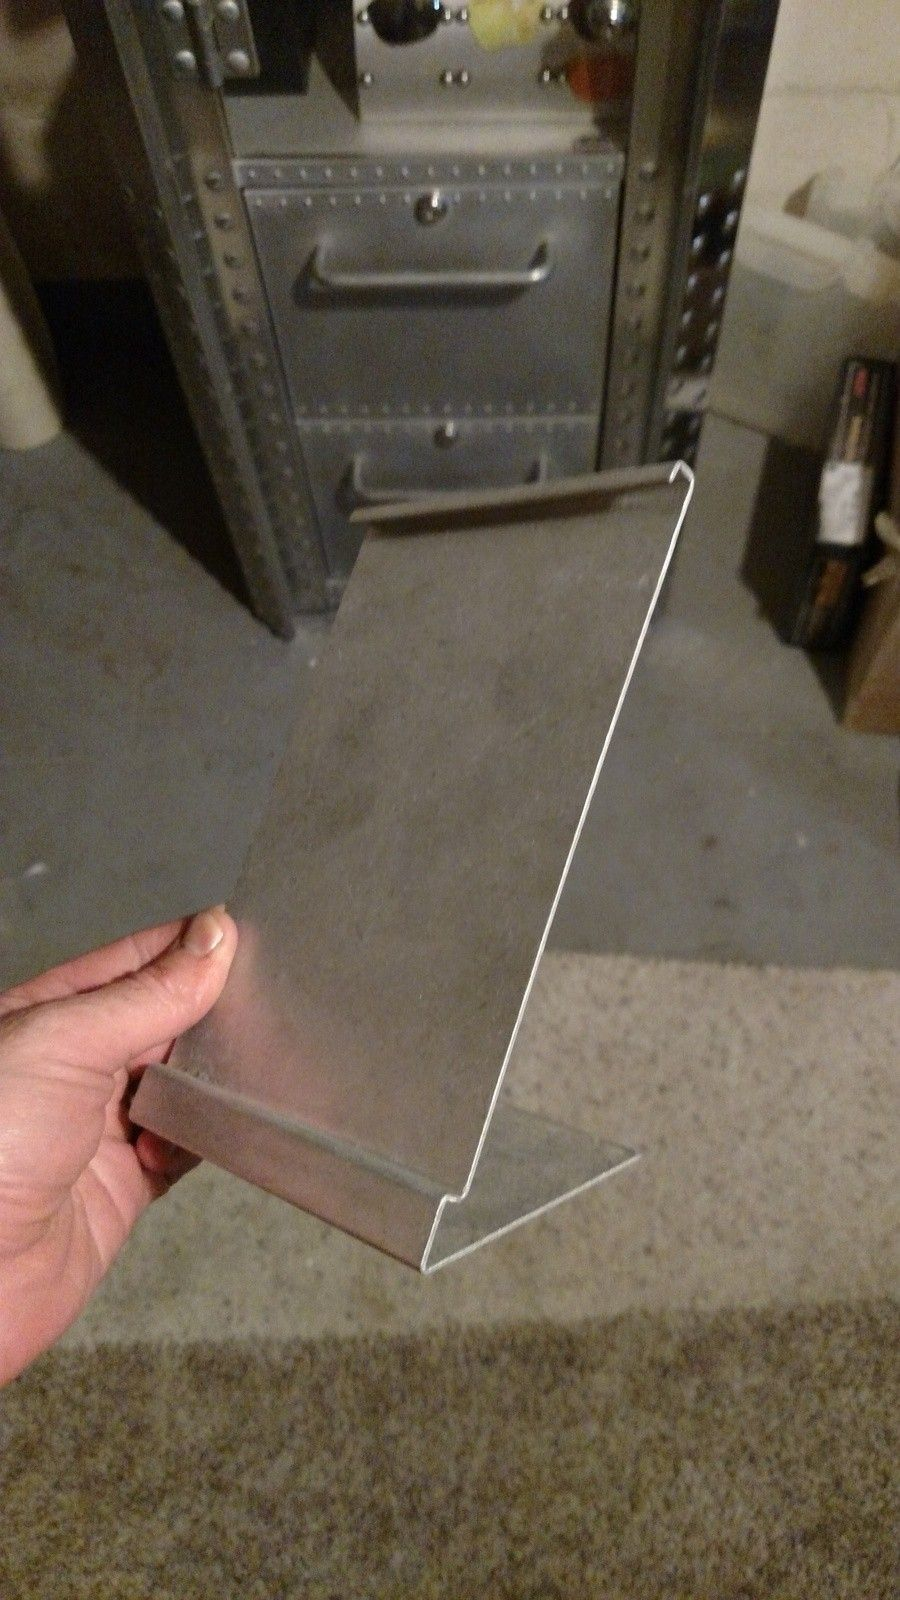 Oakley display piece or not? - IMG_20150901_193725343.jpg